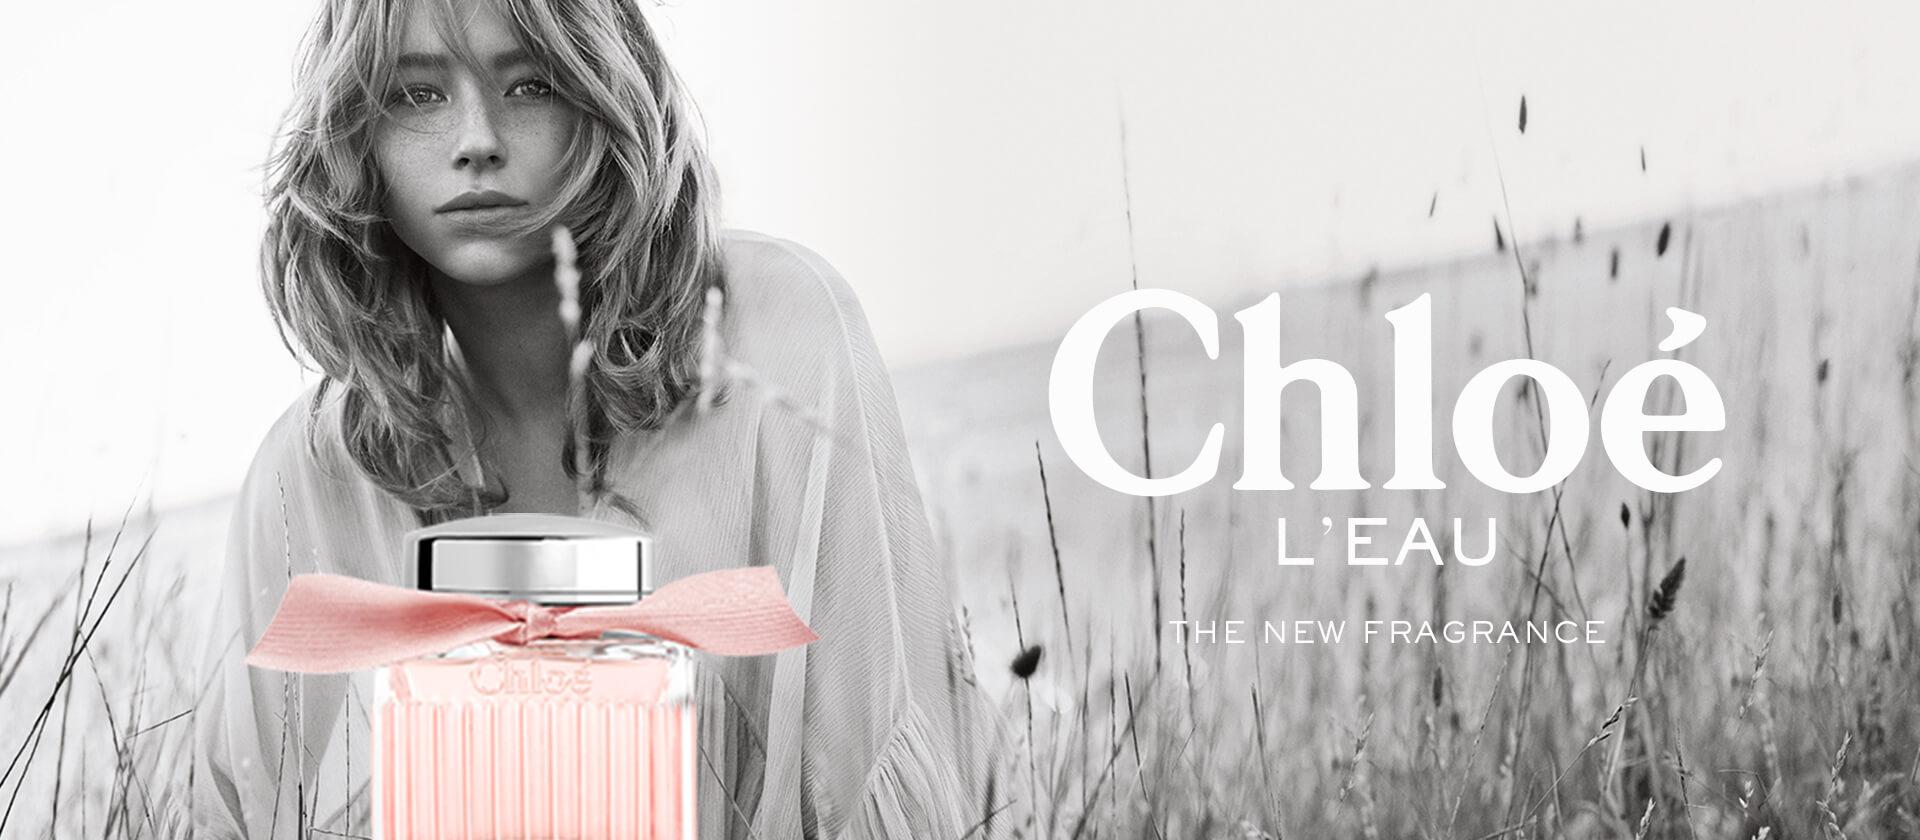 Muestra Gratis perfume Eau de Chloé